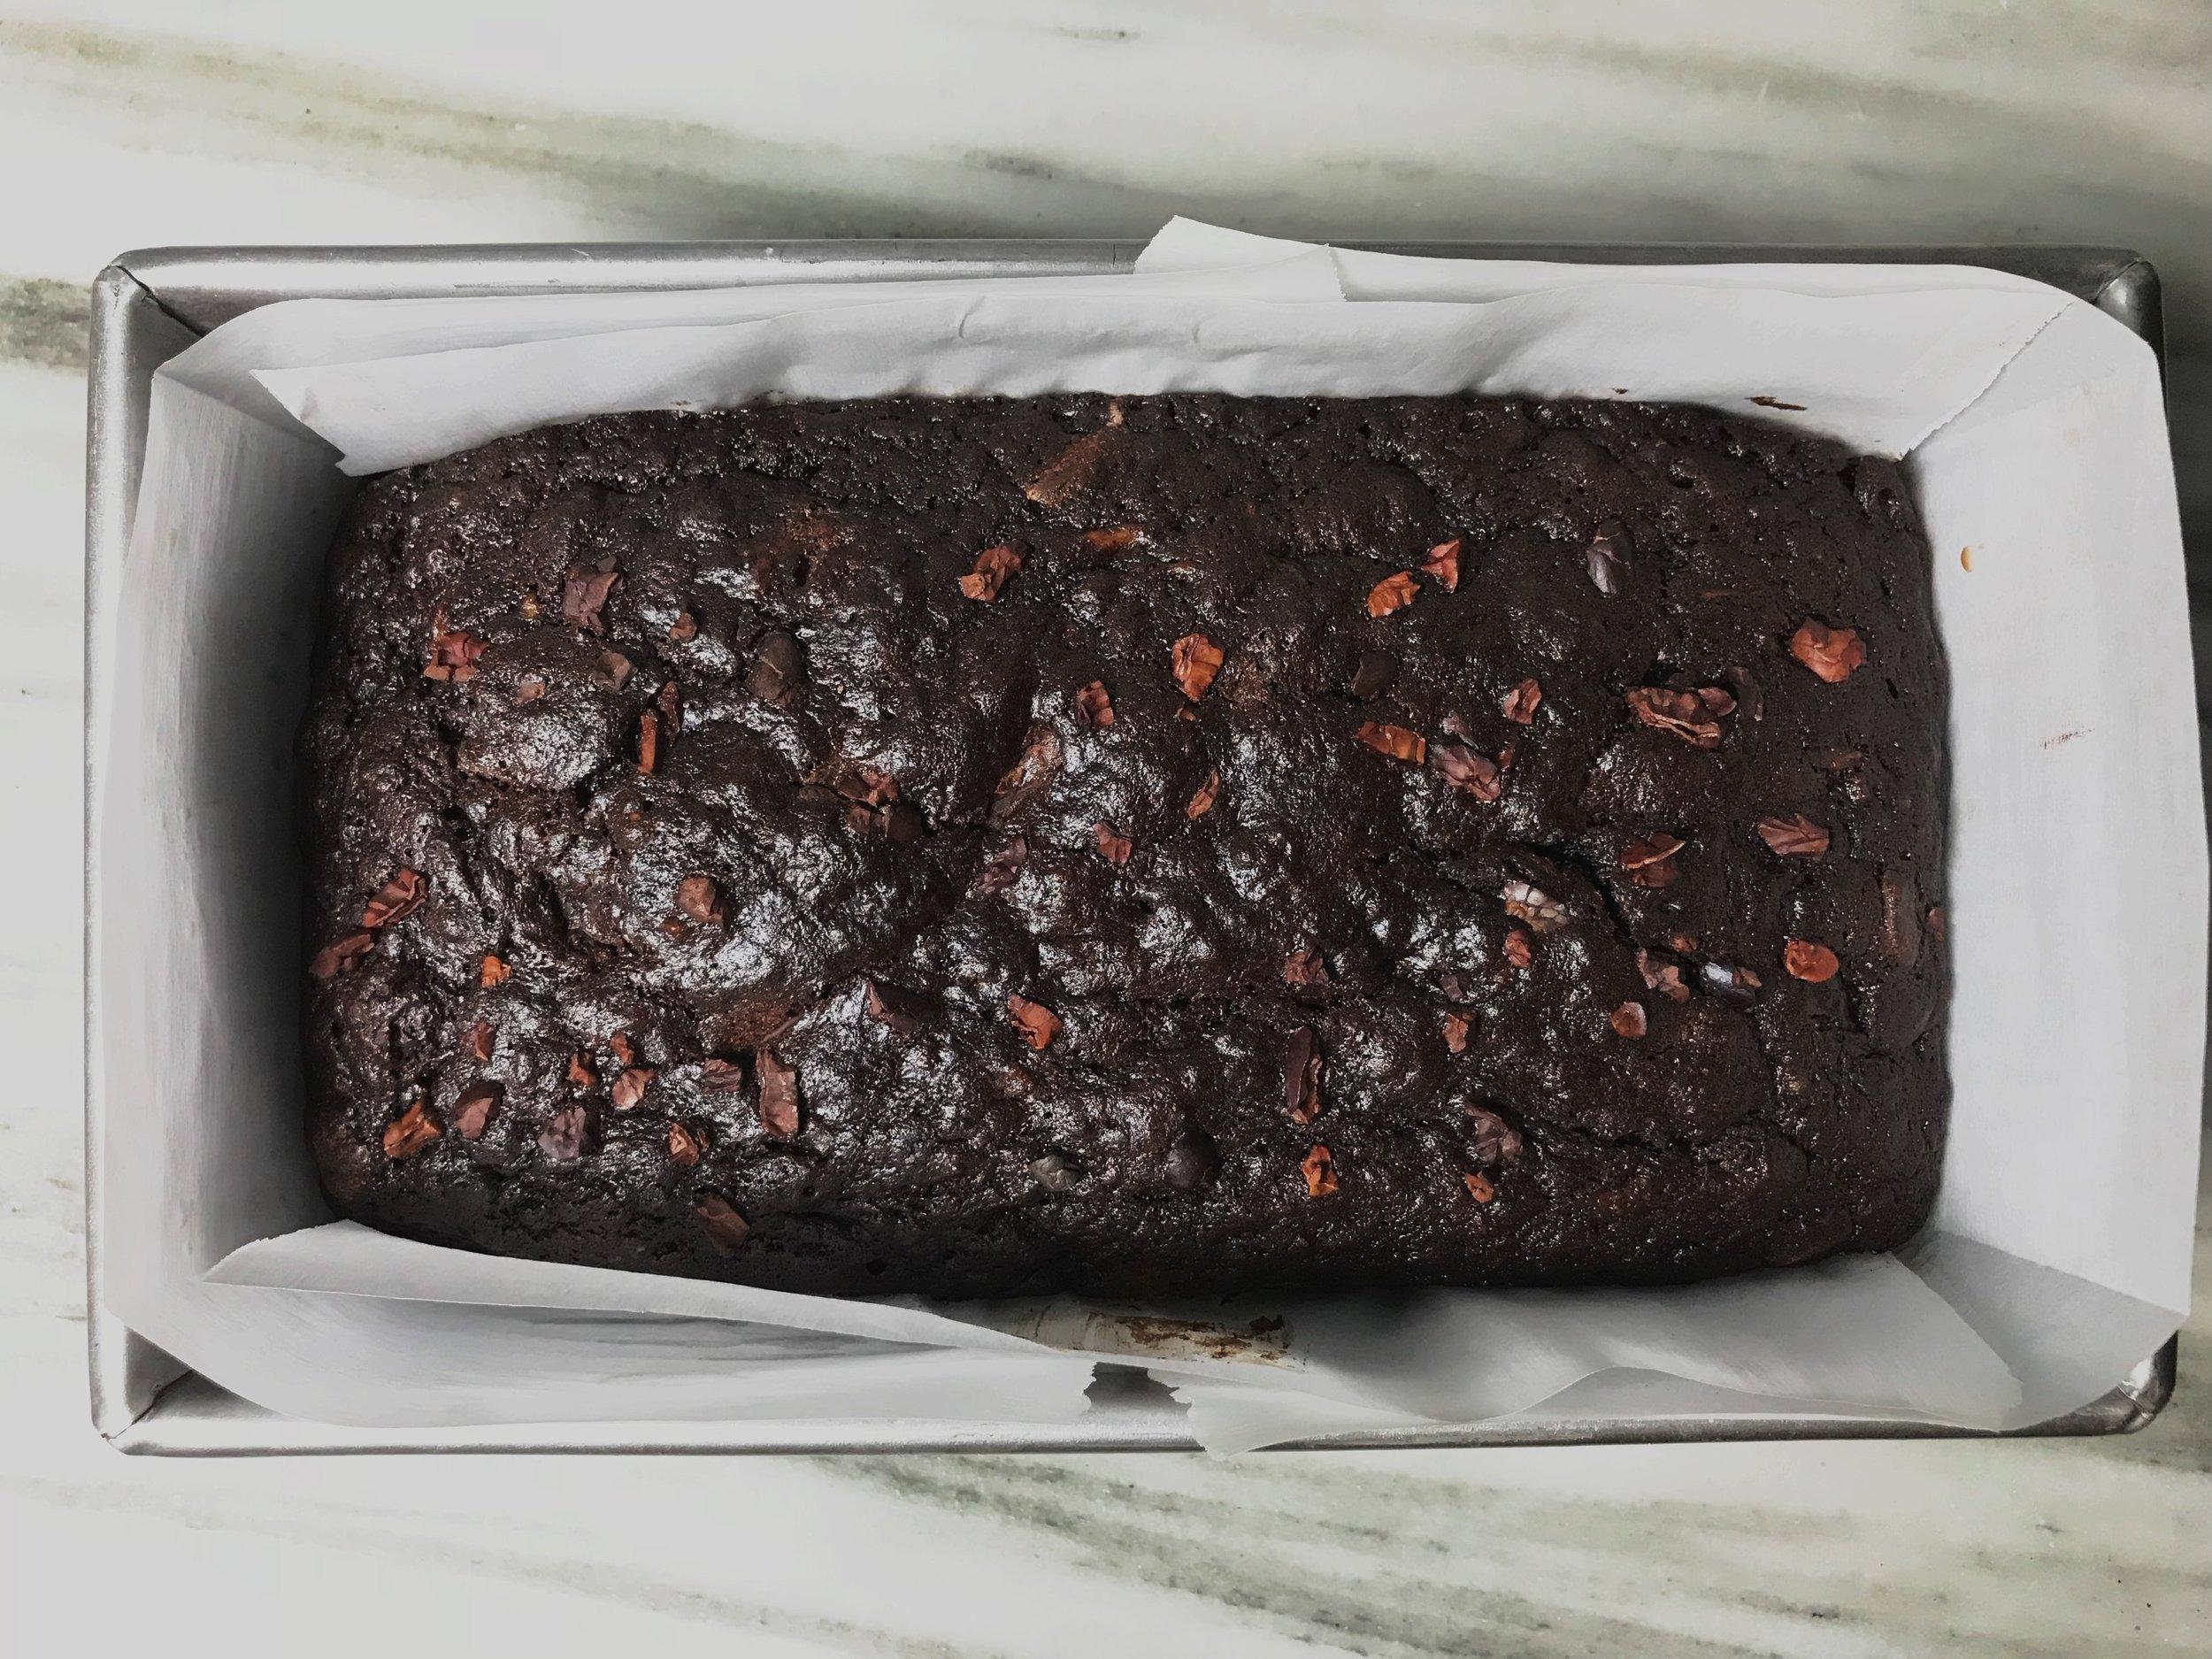 24hourkitchen-double-chocolate-banana-bread